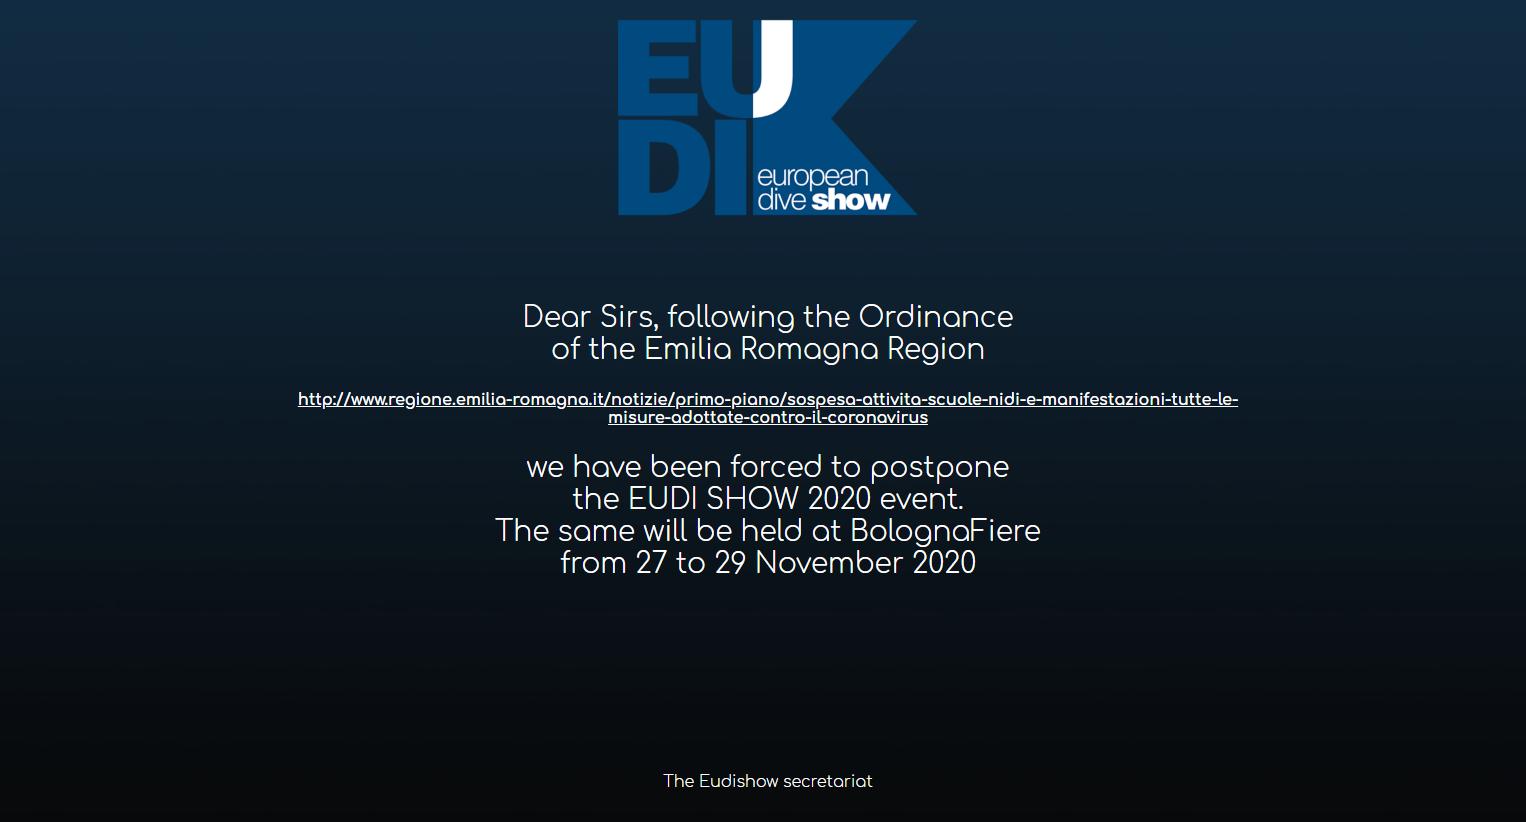 European Dive Show Postponed Due To Coronavirus Outbreak In Italy